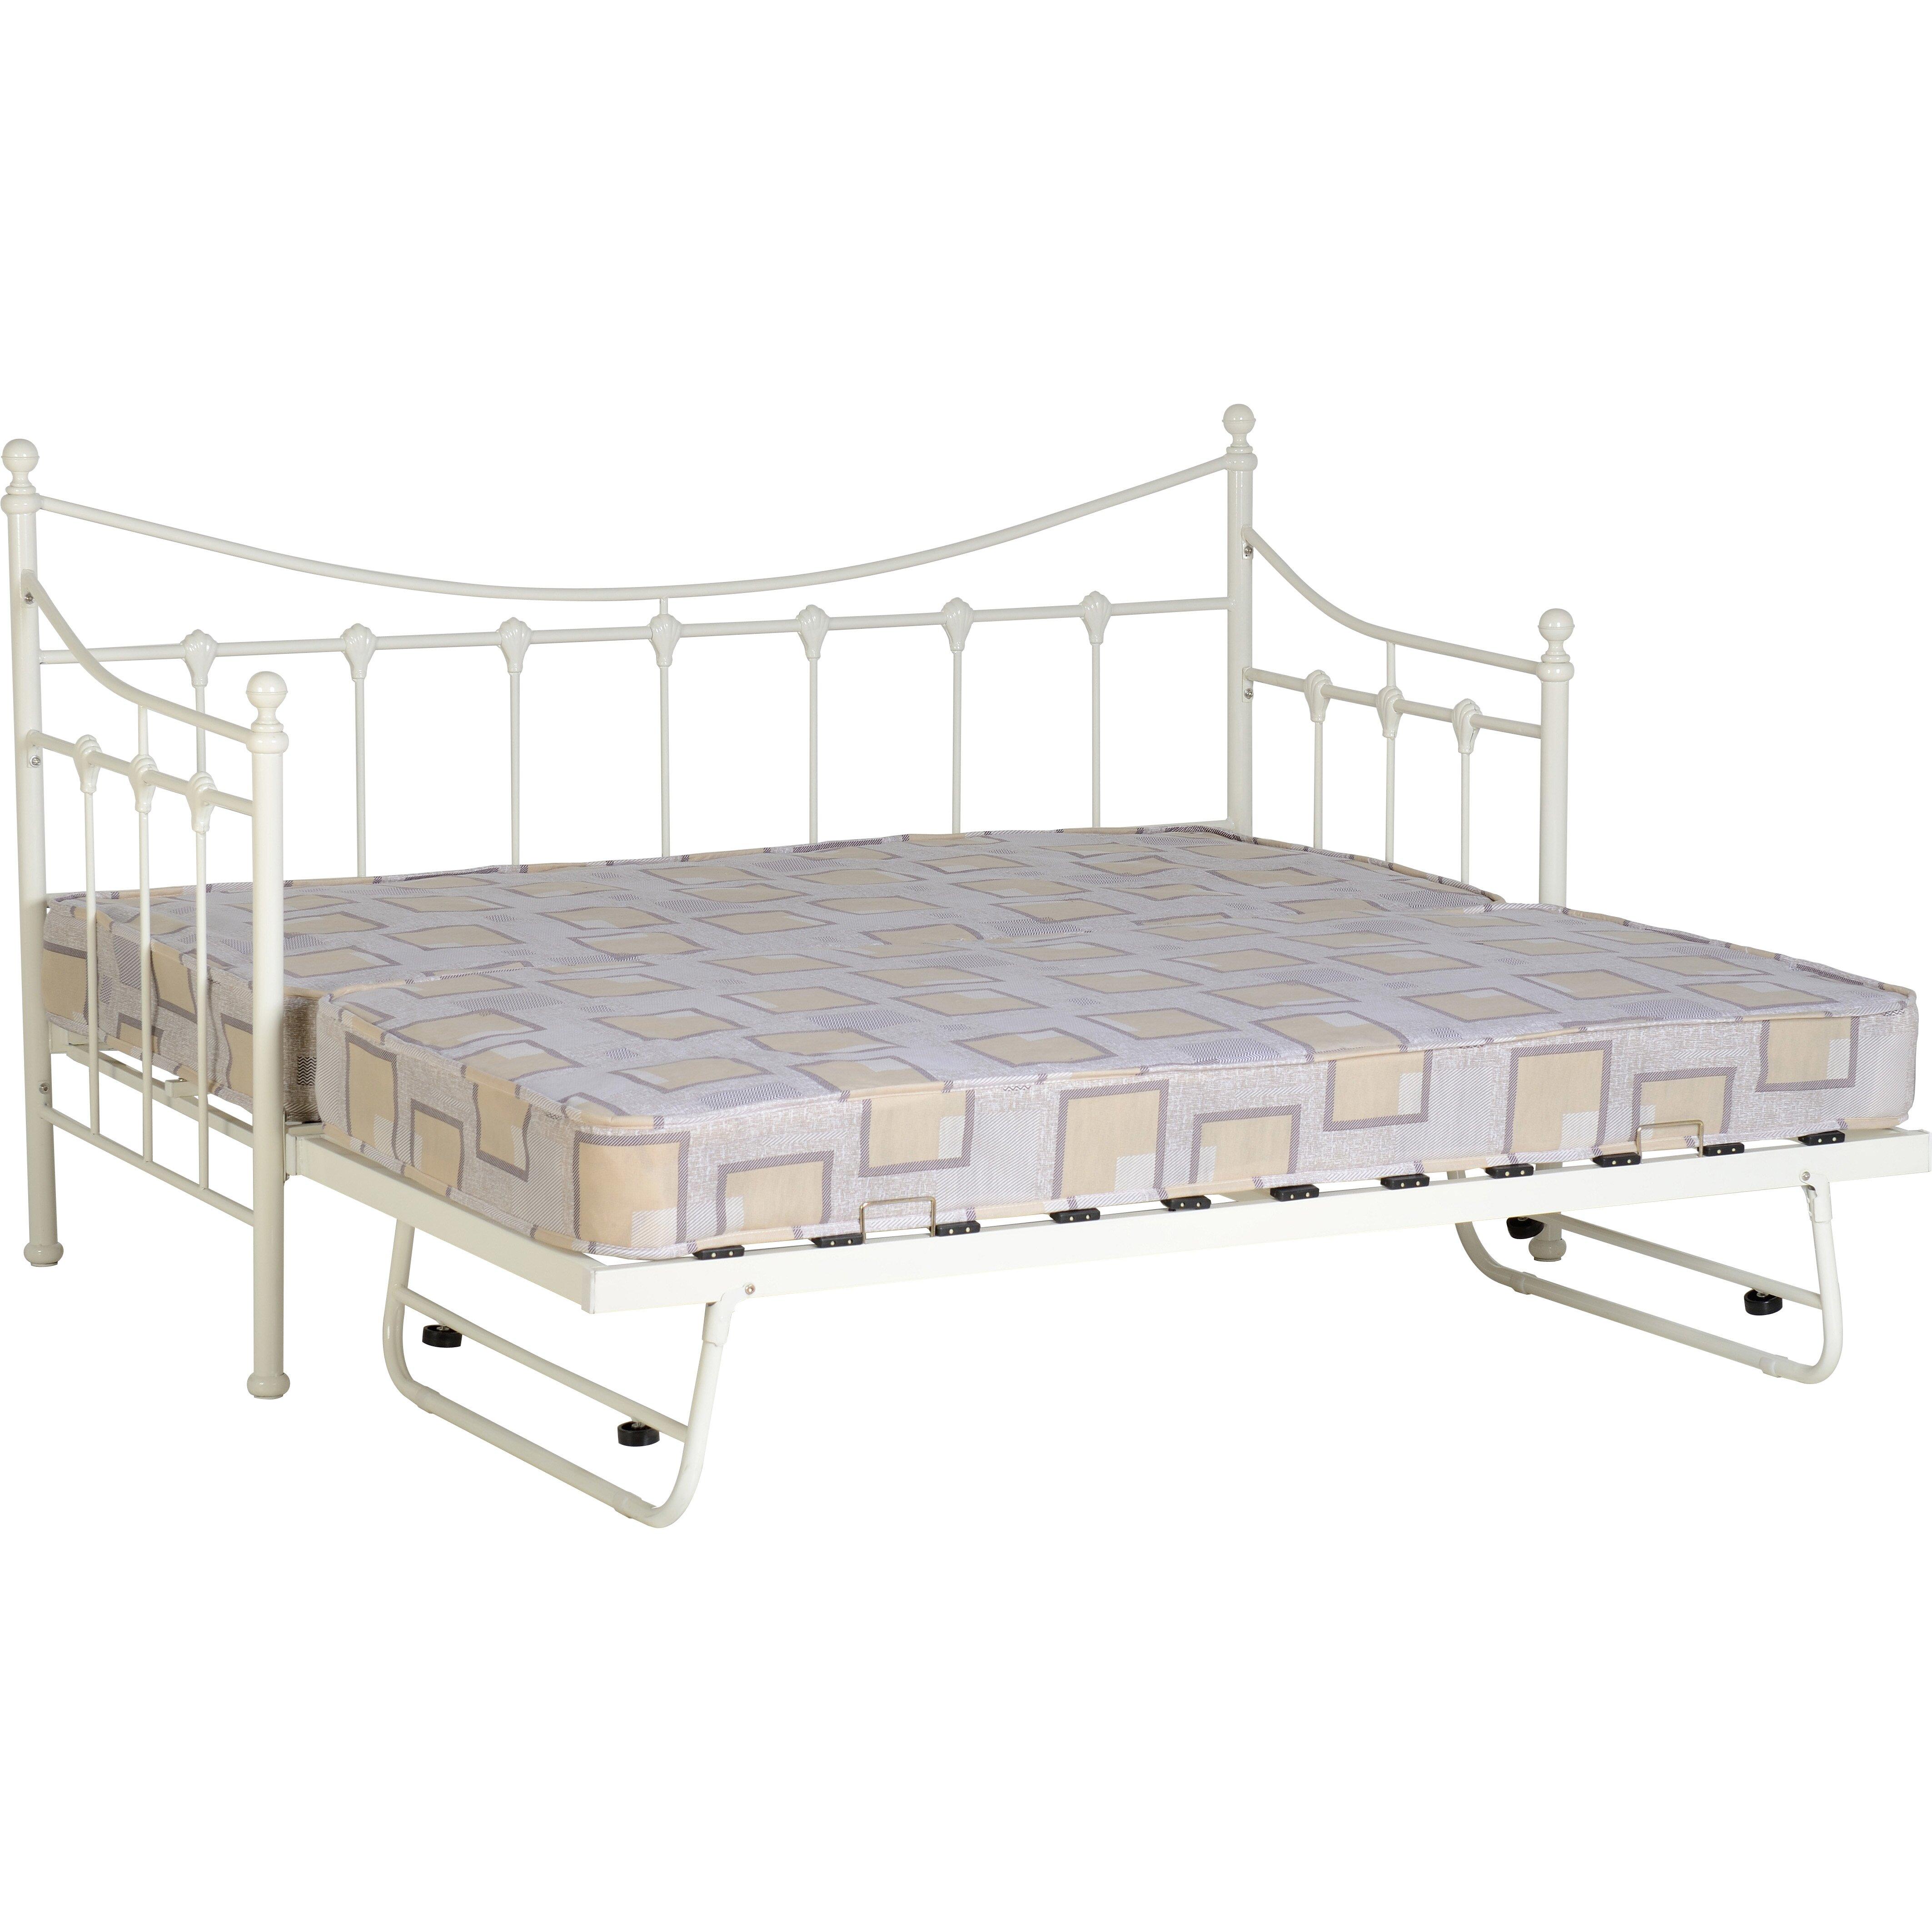 dcor design tagesbett torino bewertungen. Black Bedroom Furniture Sets. Home Design Ideas